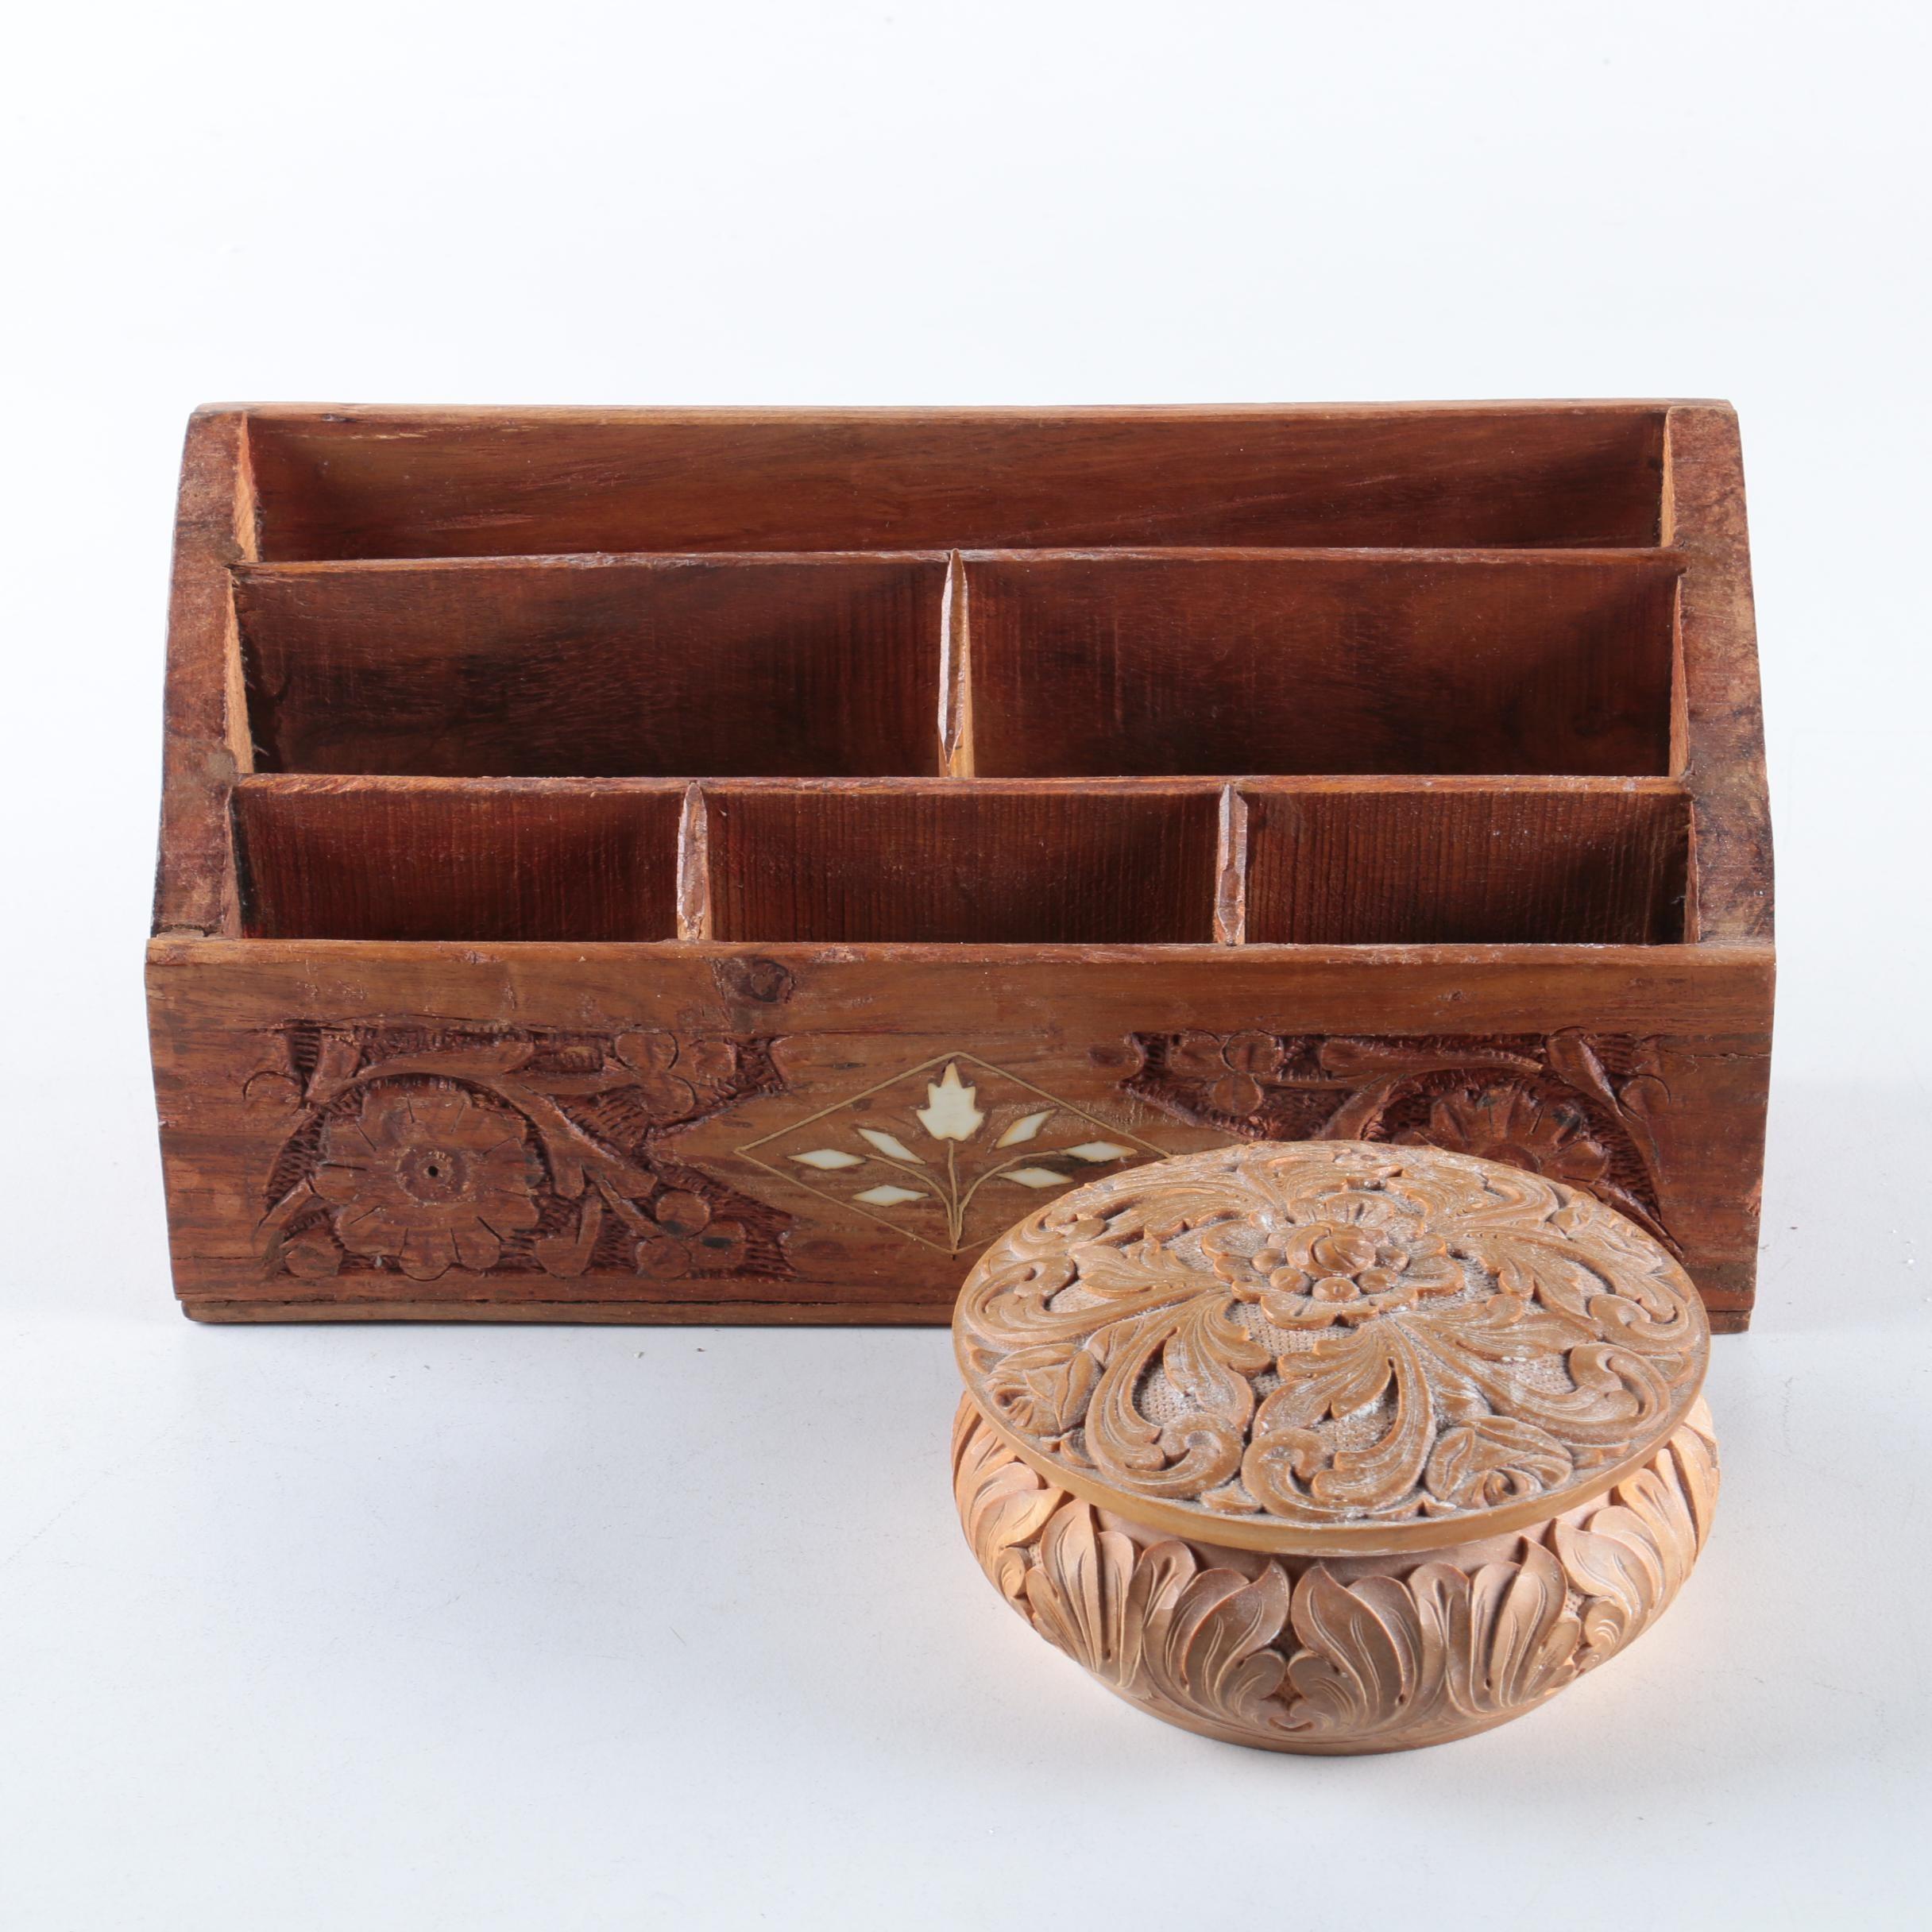 Wooden Organizer and Trinket Box